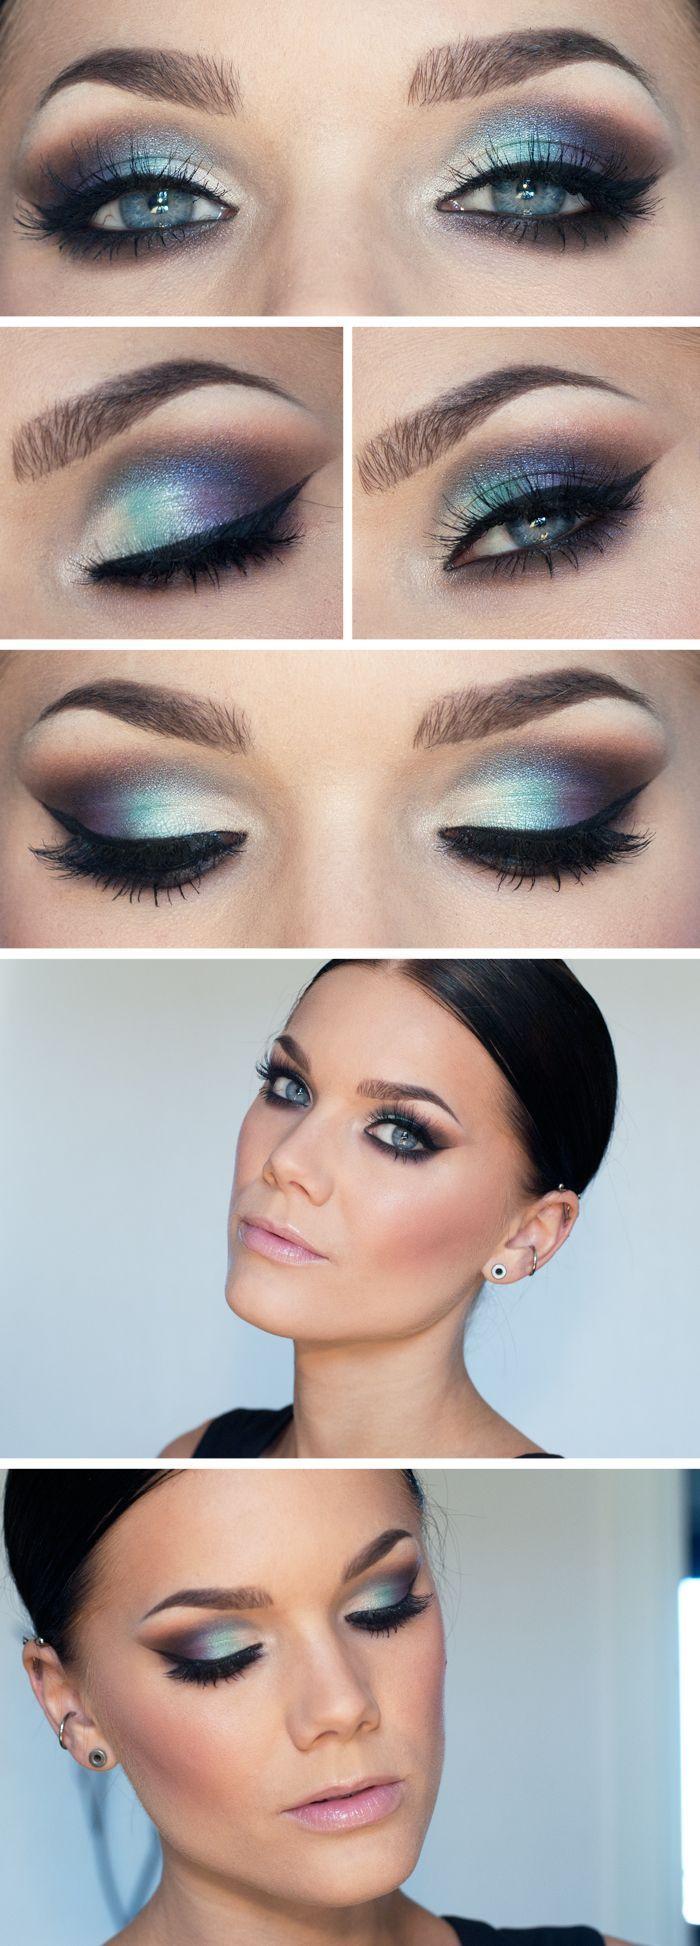 Blue Makeup: 17 Best Ideas About Blue Makeup On Pinterest